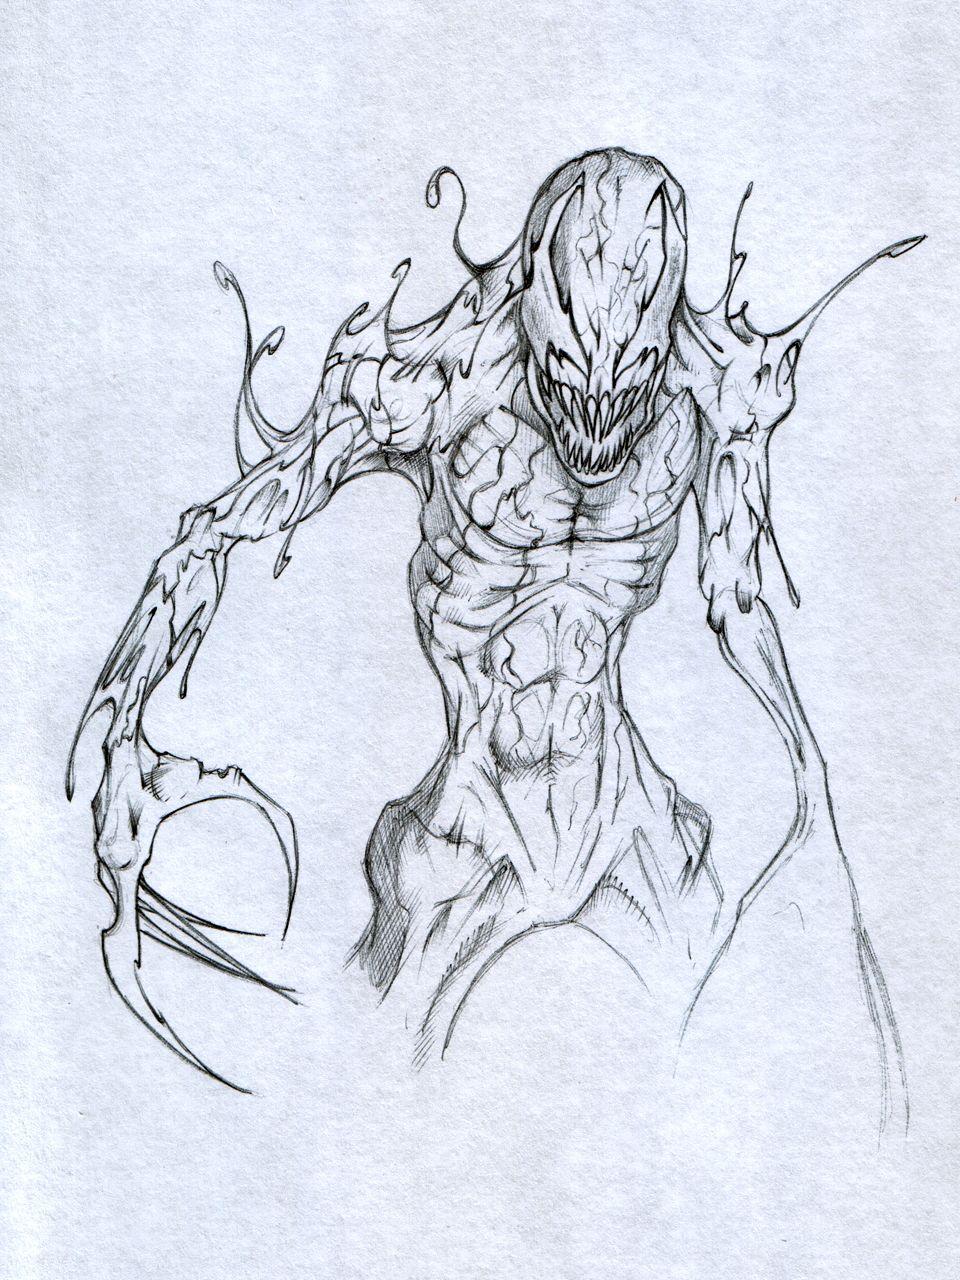 Spiderman vs carnage drawings - photo#43